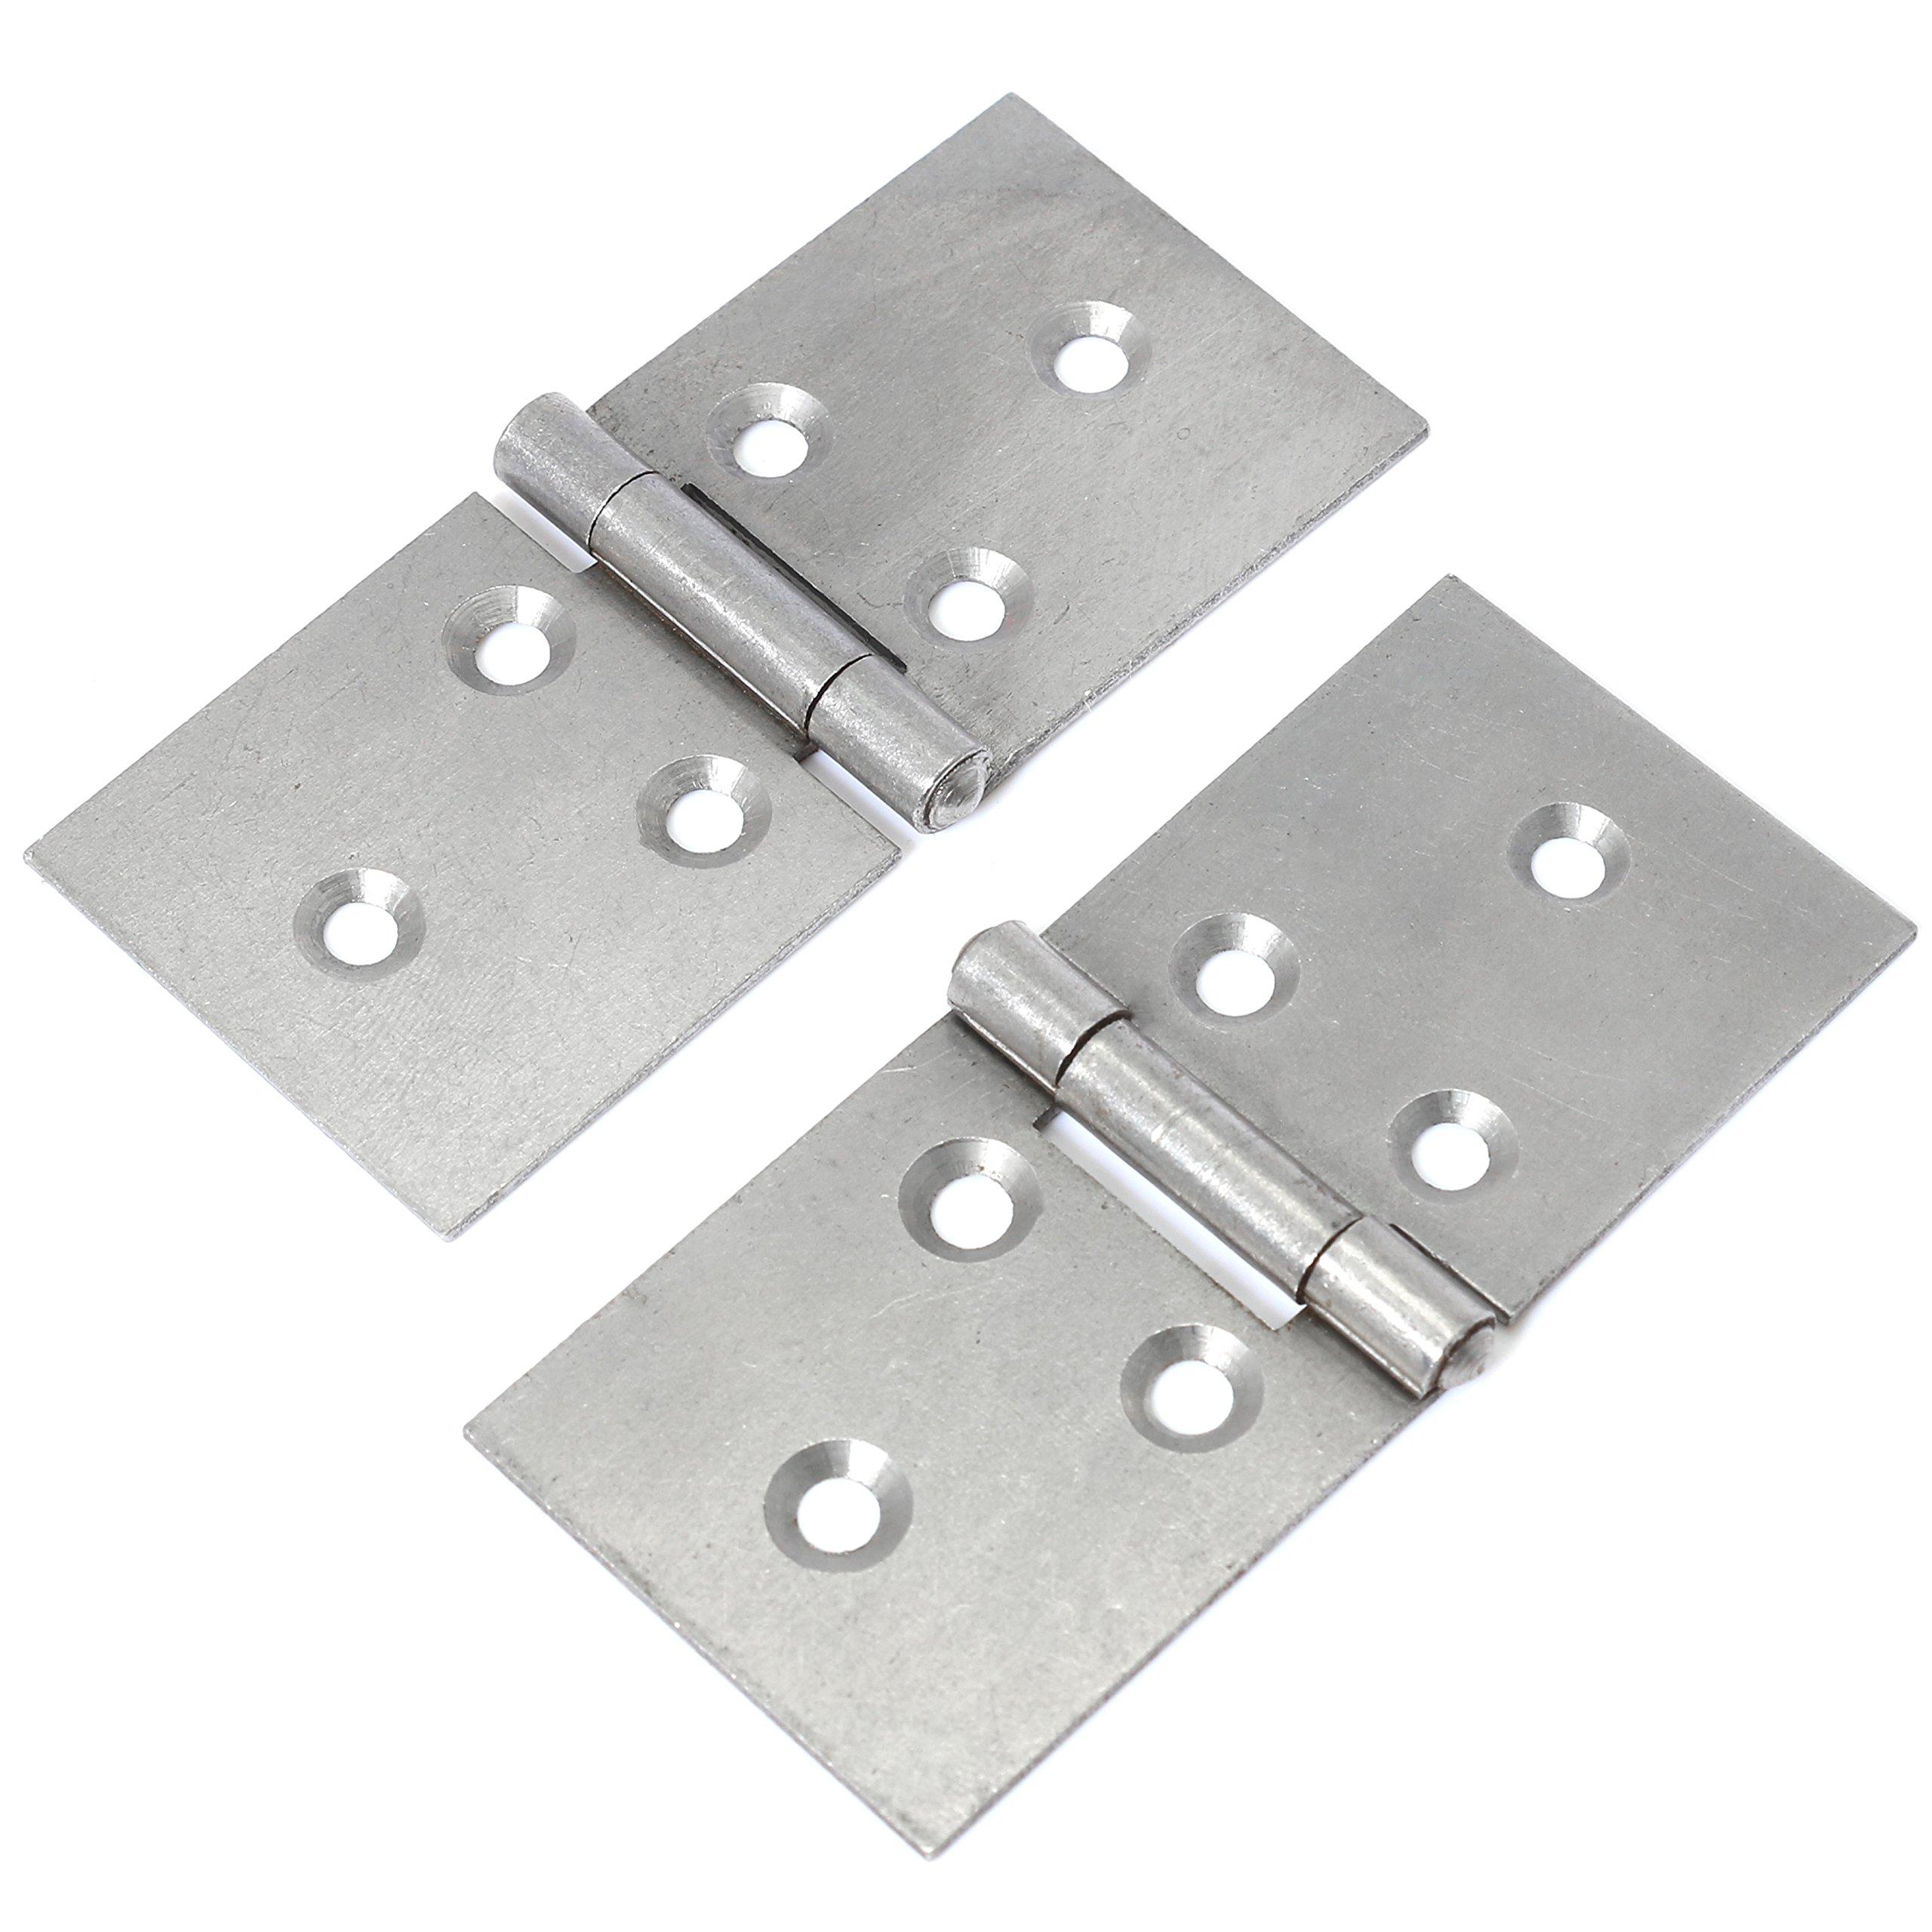 Counter Hinge Various sizes 2 x Heavy Duty Steel Back Flap Hinges Box Hinge